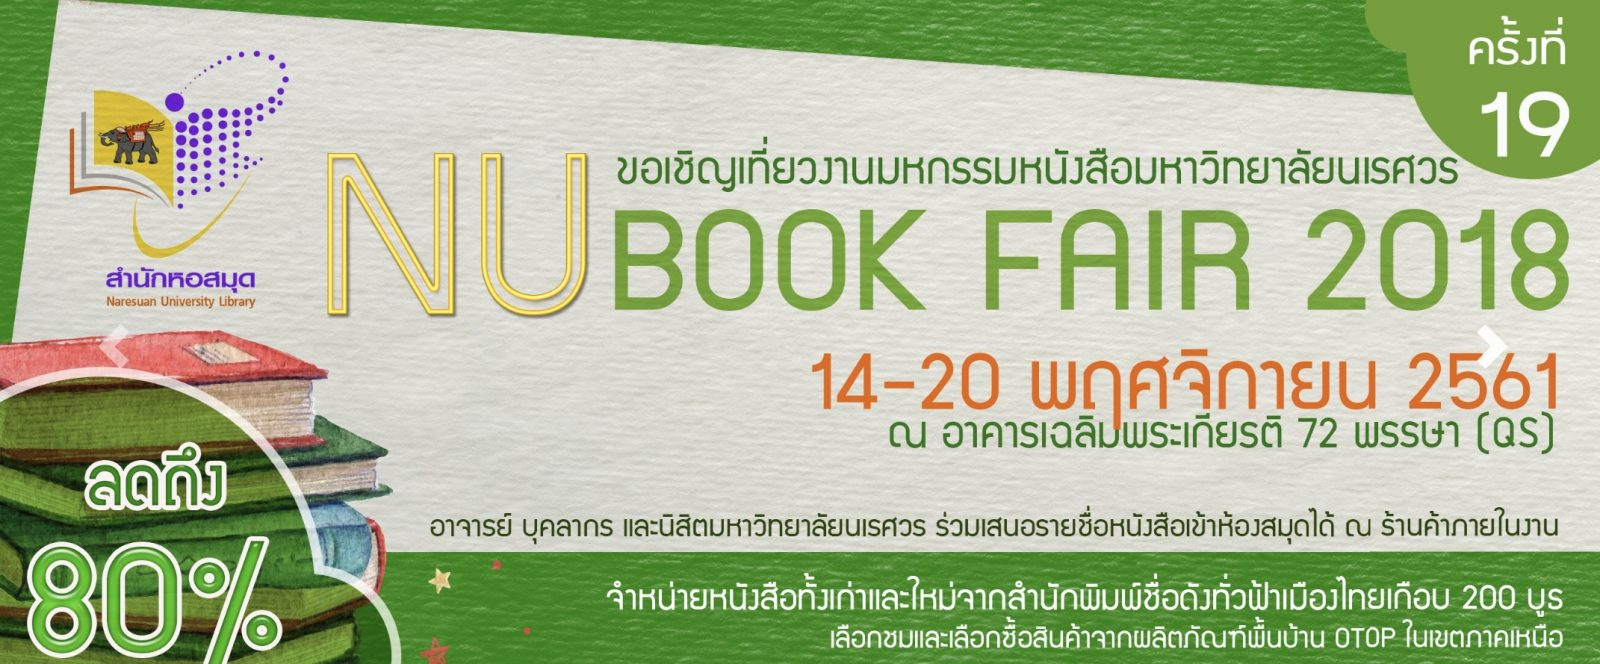 nu book fair 2018